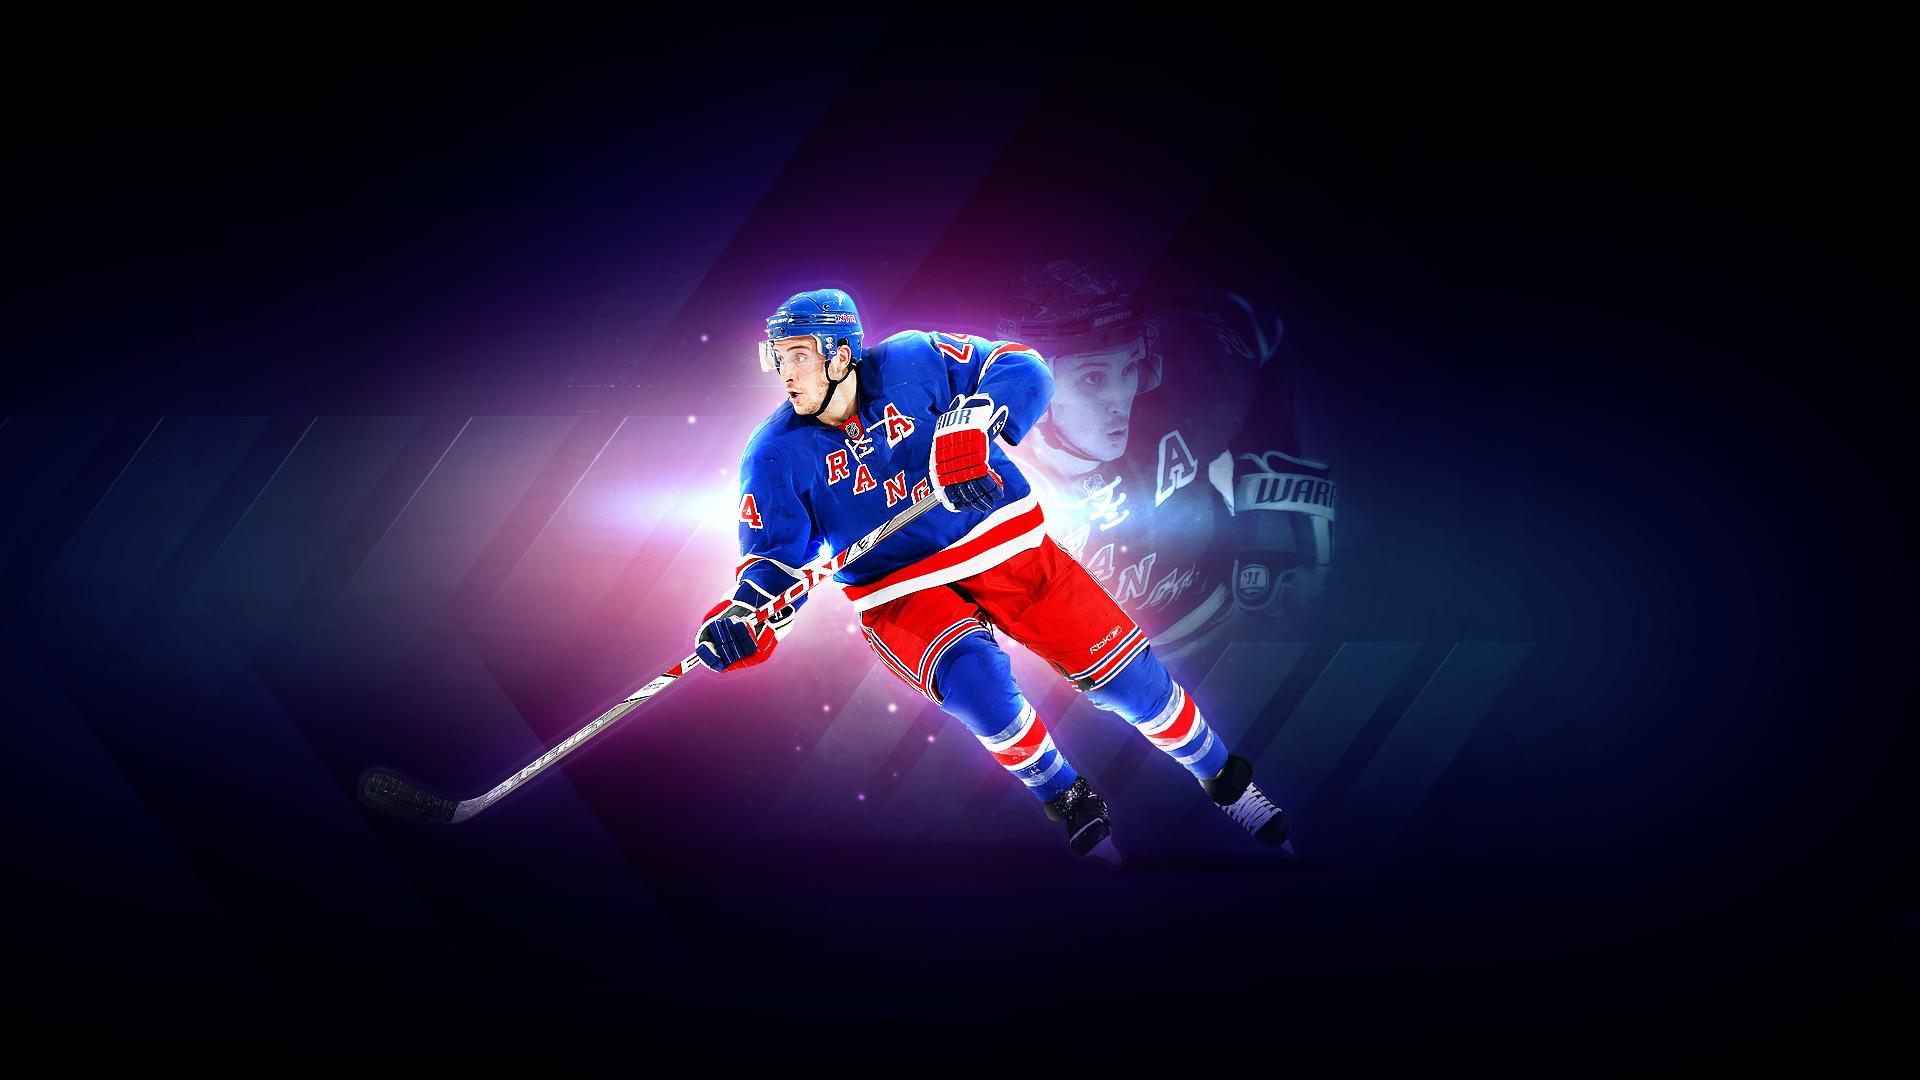 Картинки хоккея на телефон